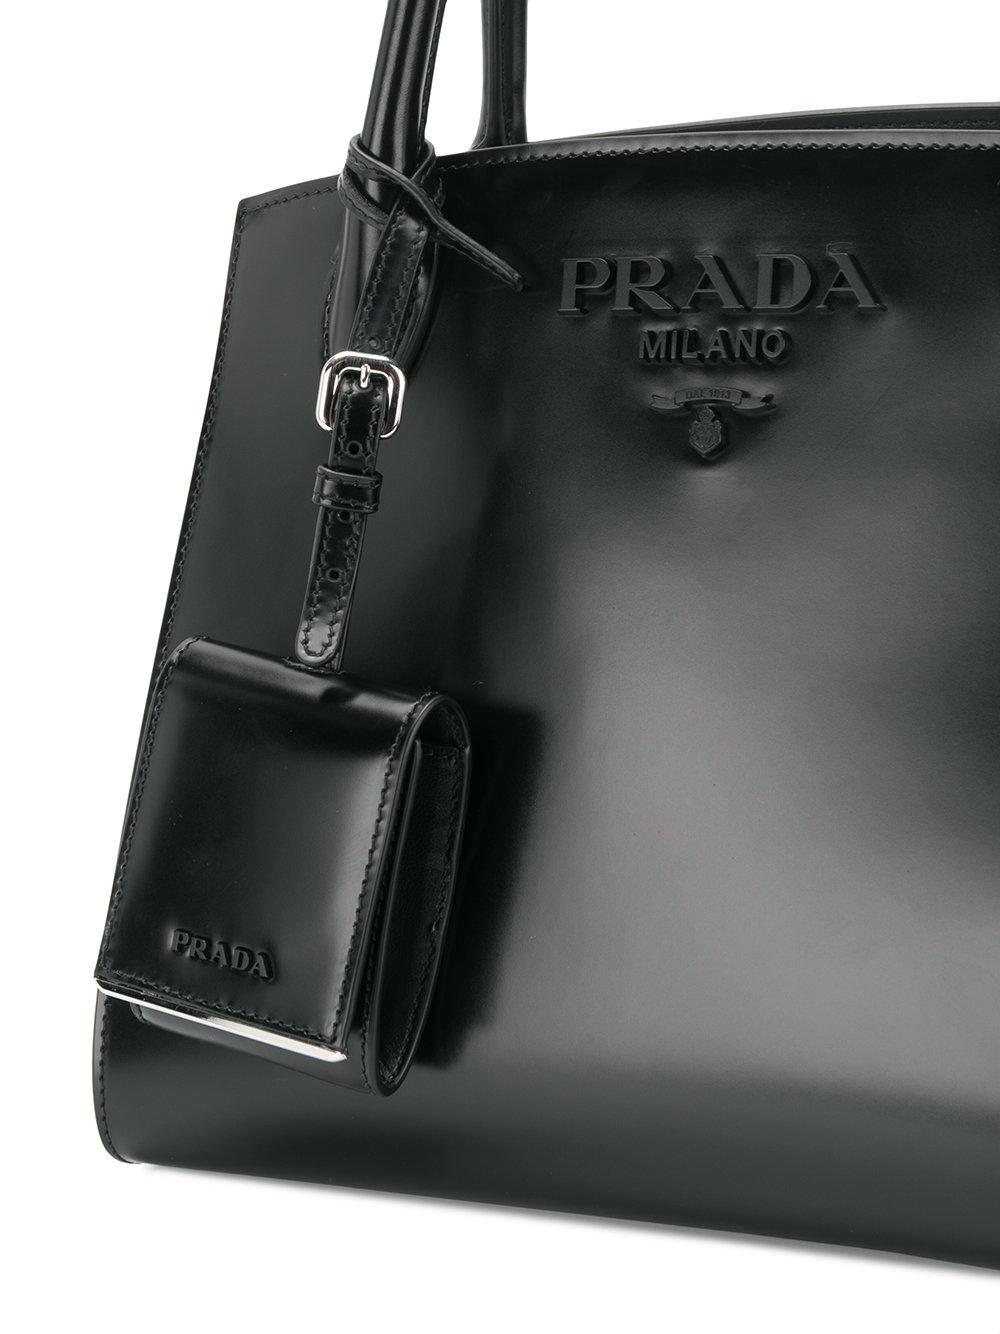 ffa21a2a2649 Prada Monochrome Paradigme Tote Bag in Black - Lyst